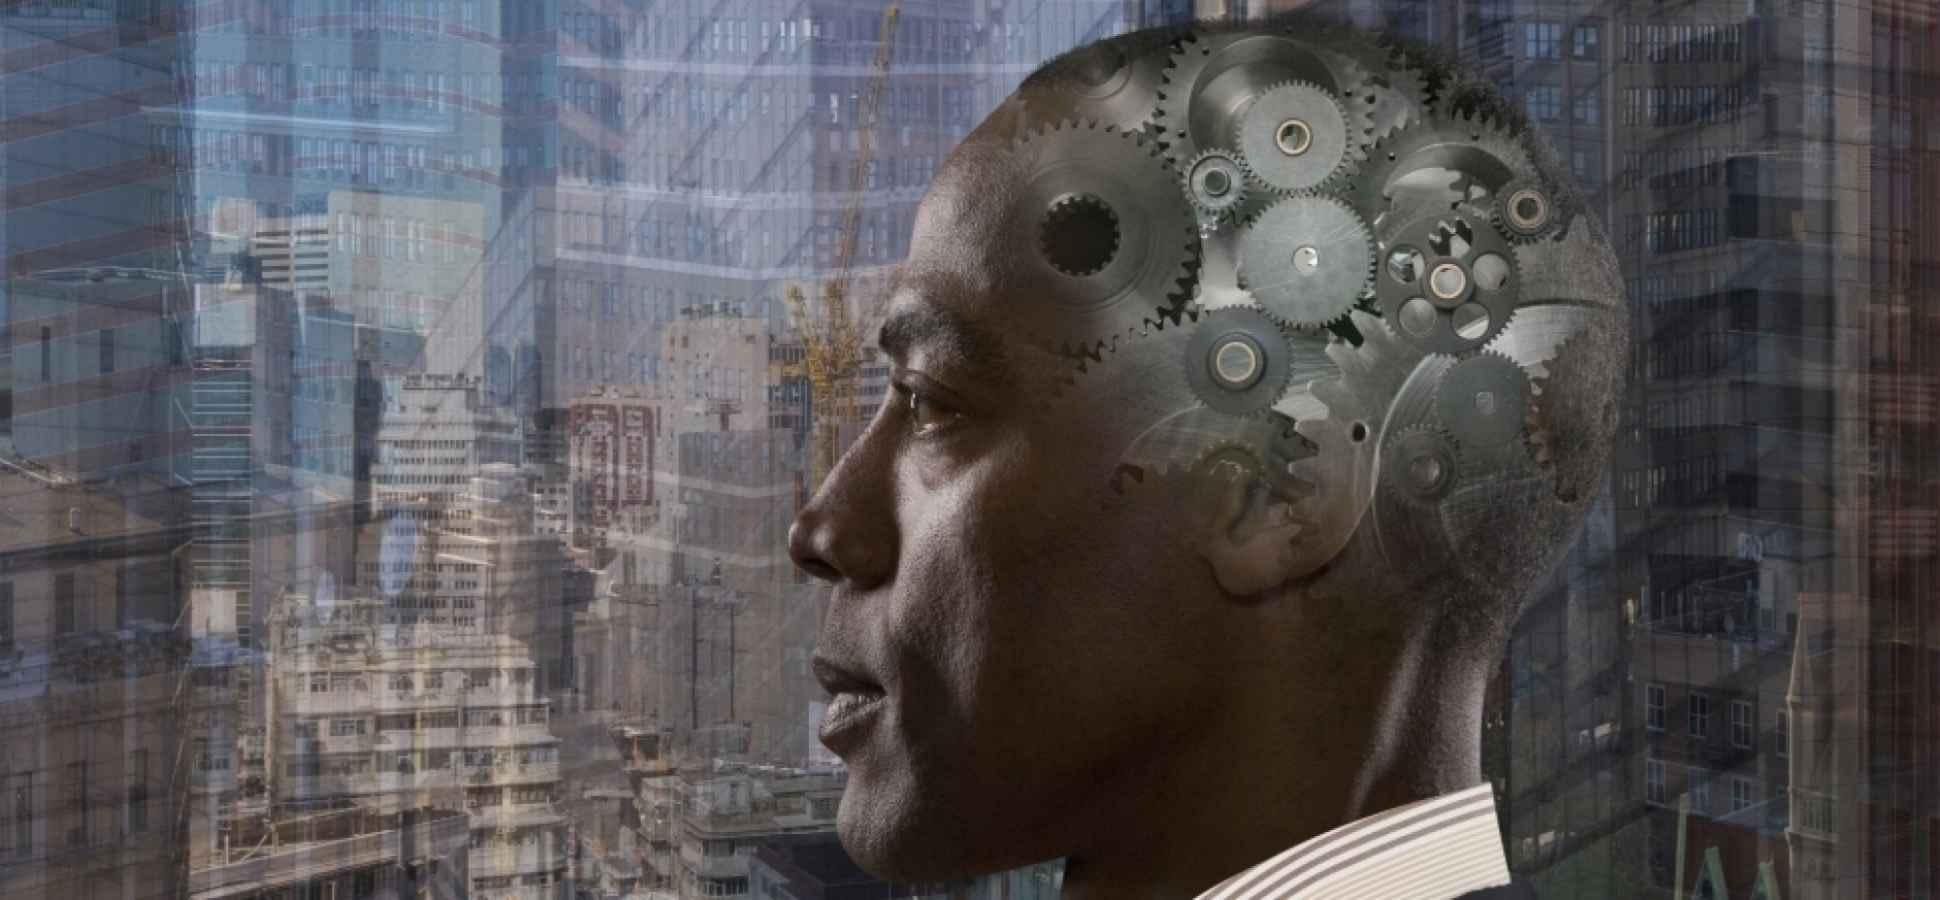 The Strange Future of Hybrid Thinking, According to Google's Director of Engineering